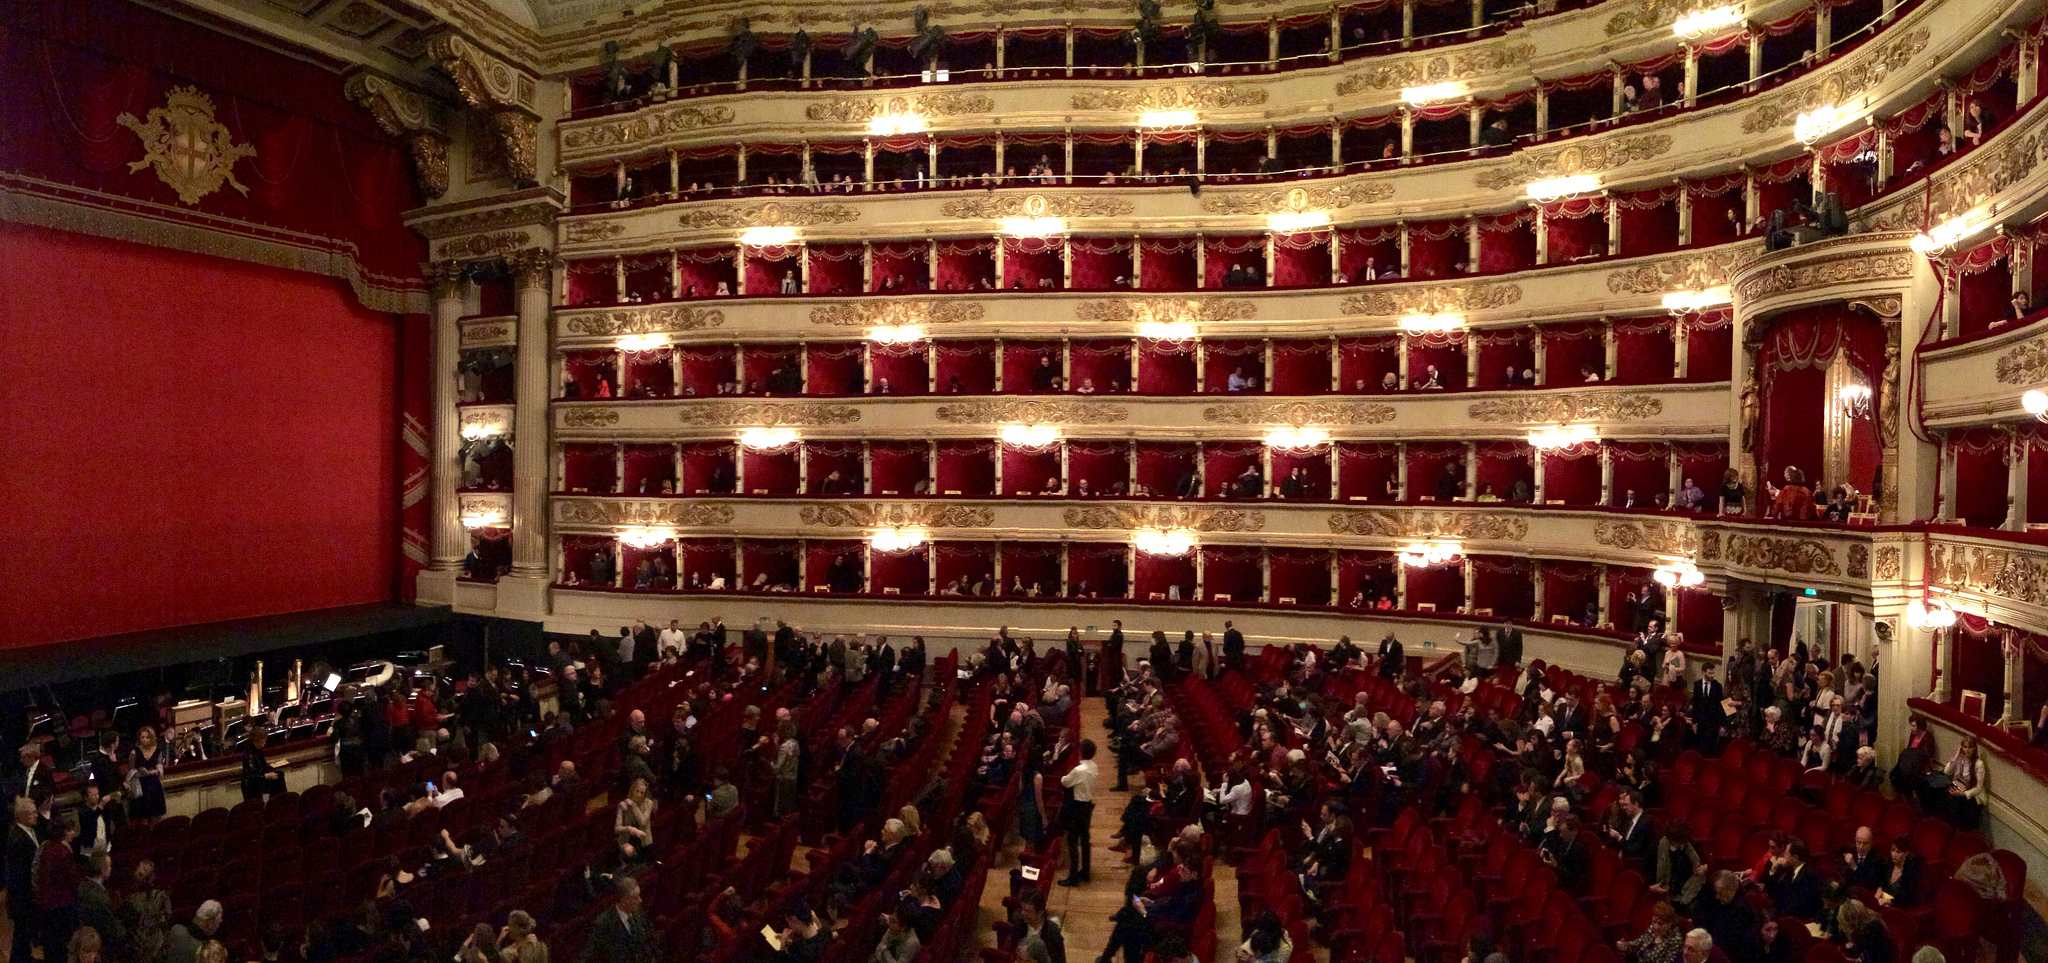 Сцена в театре Ла Скала, Милан